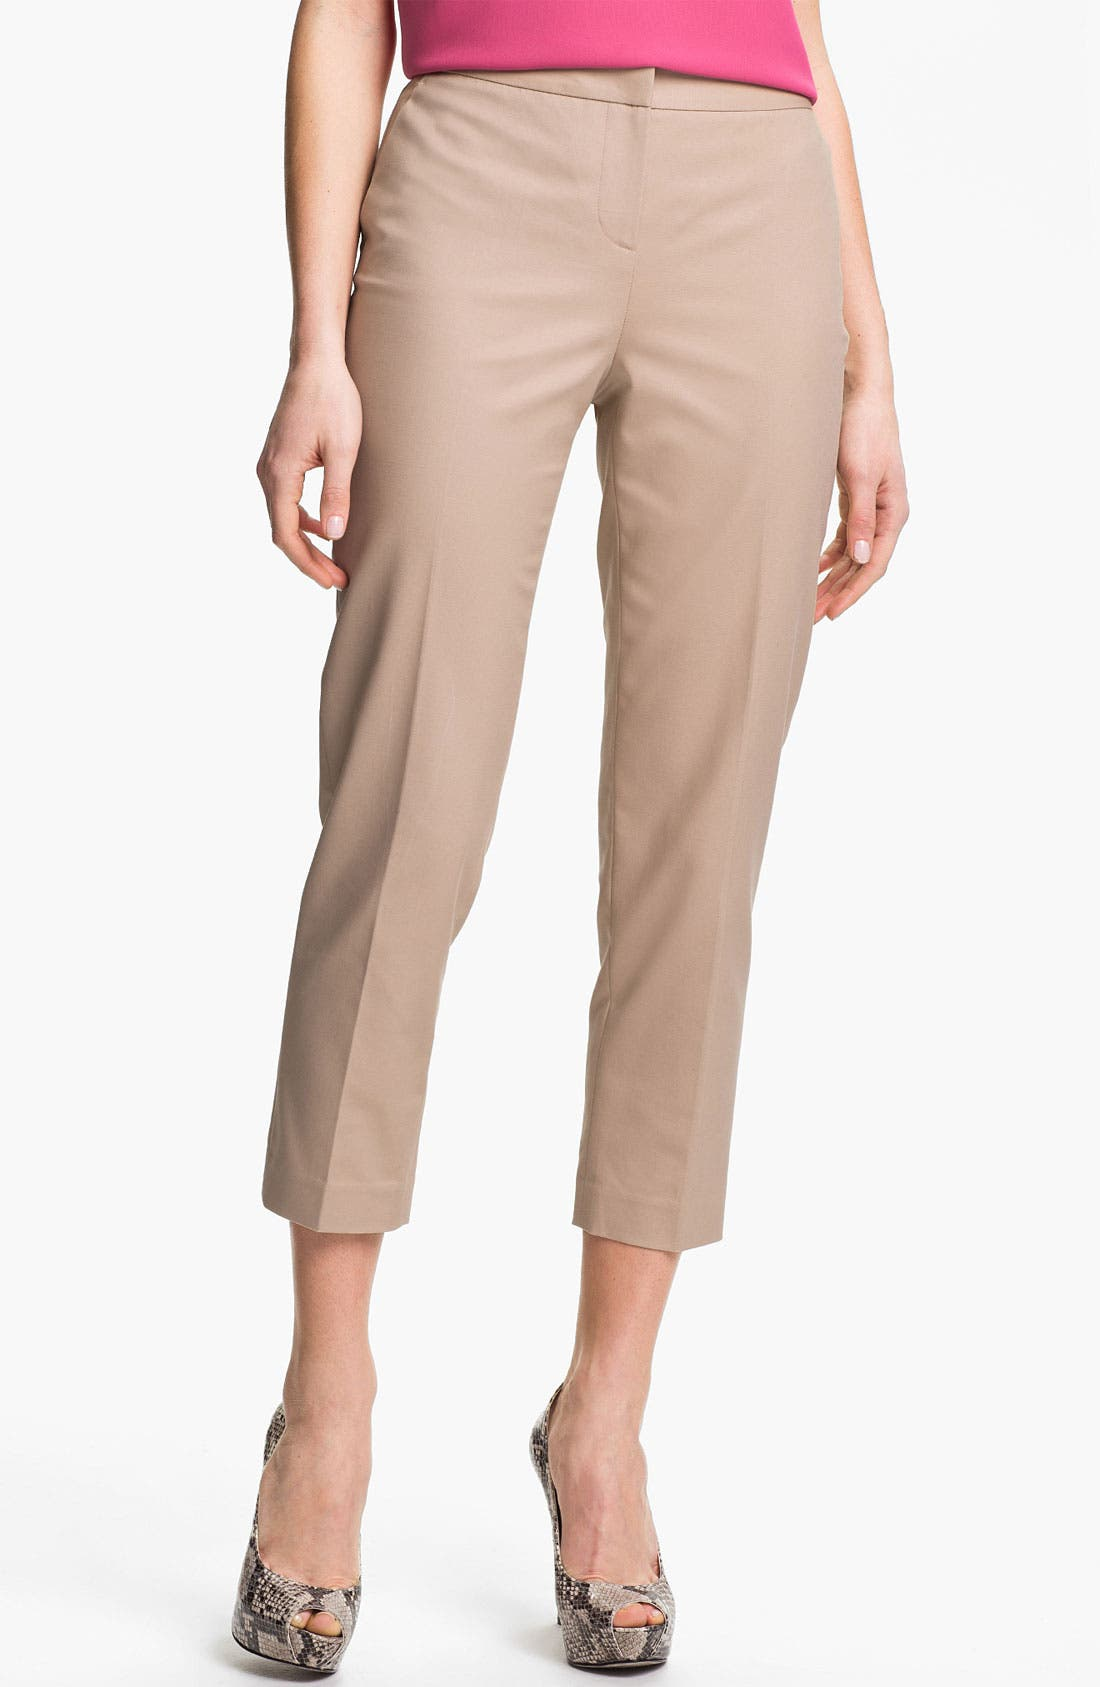 Alternate Image 1 Selected - Halogen® 'Taylor' Curvy Fit Crop Pants (Regular & Petite)